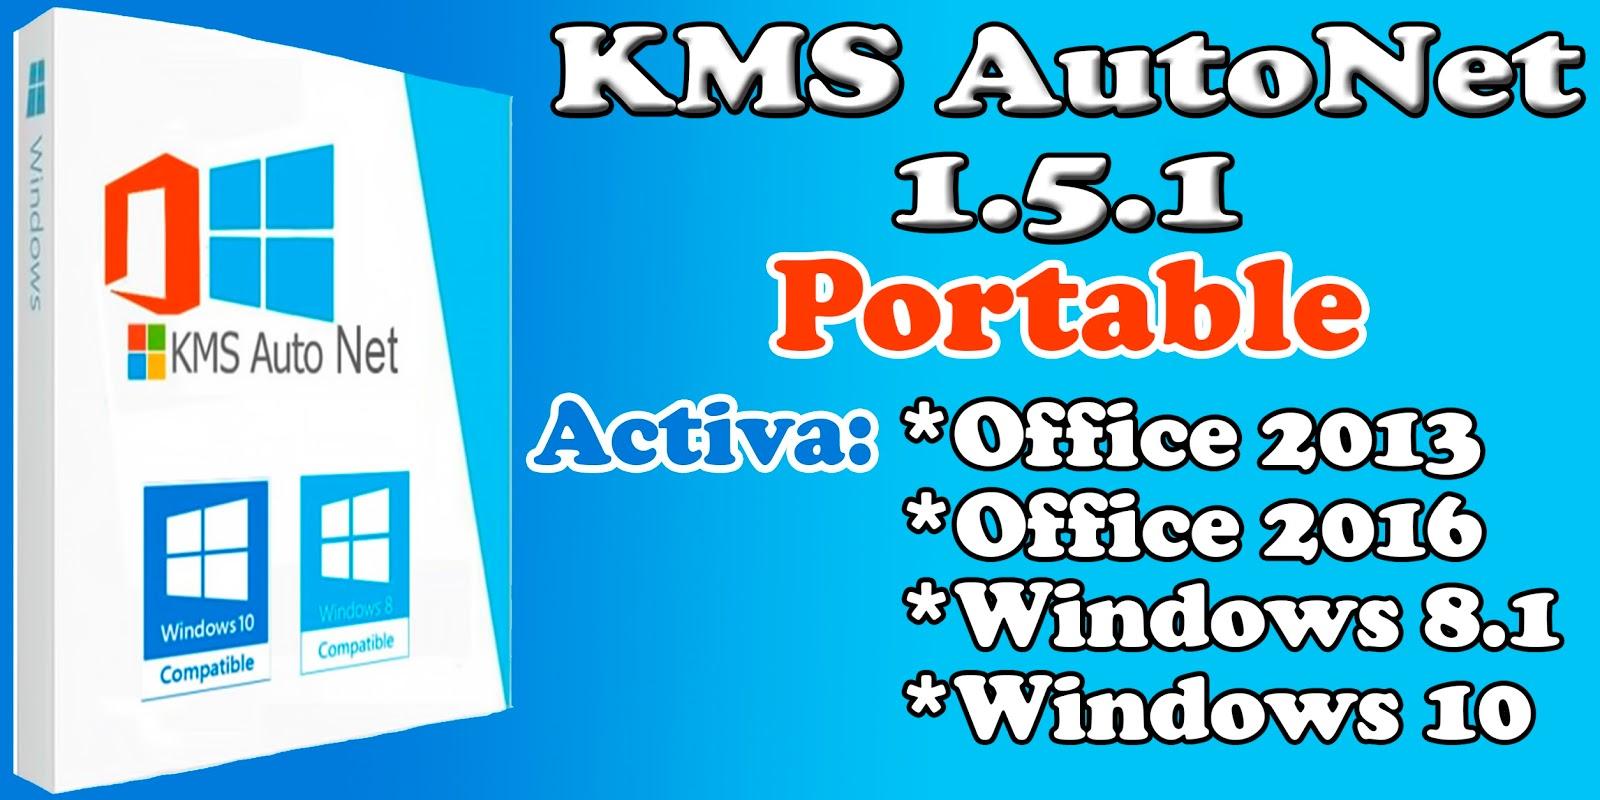 kms auto activation windows 8